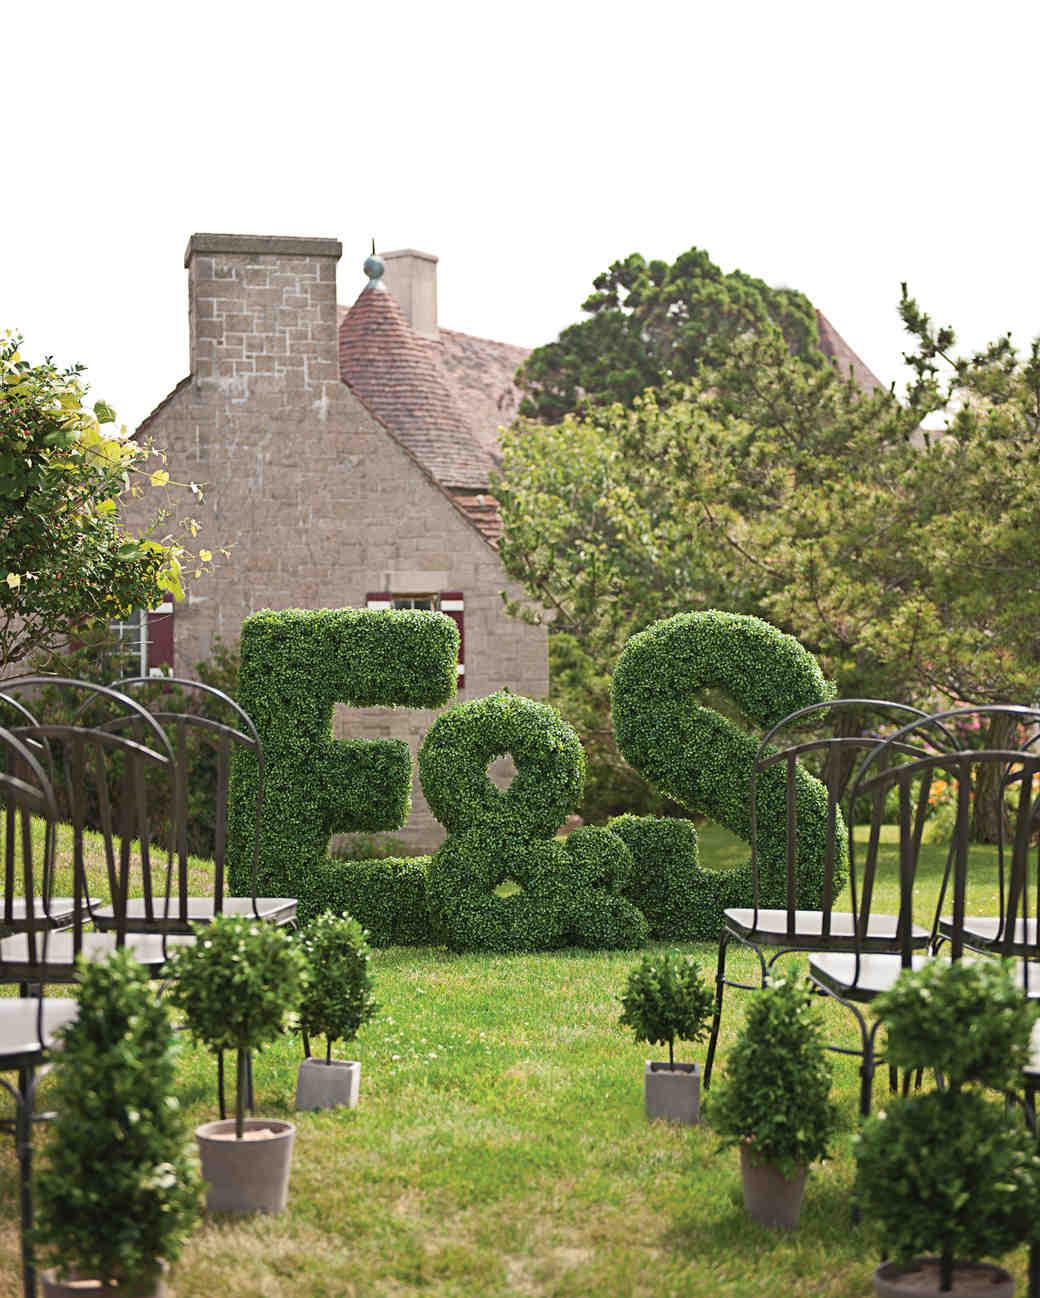 diy-wedding-backdrop-ceremony-marker-garden-topiary-travel10-0715.jpg